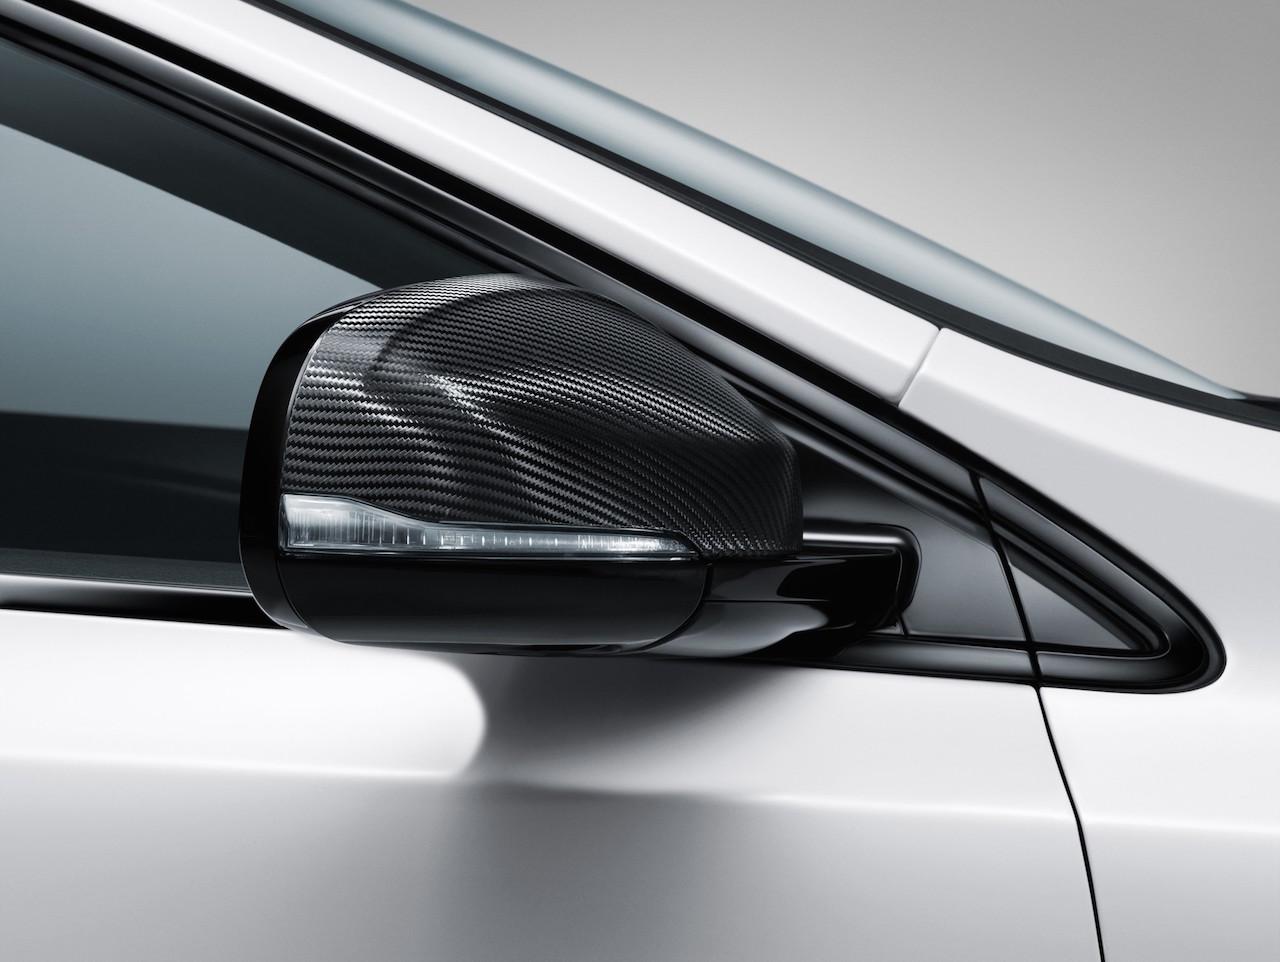 Volvo-V40-Carbon-Edition-001.jpg